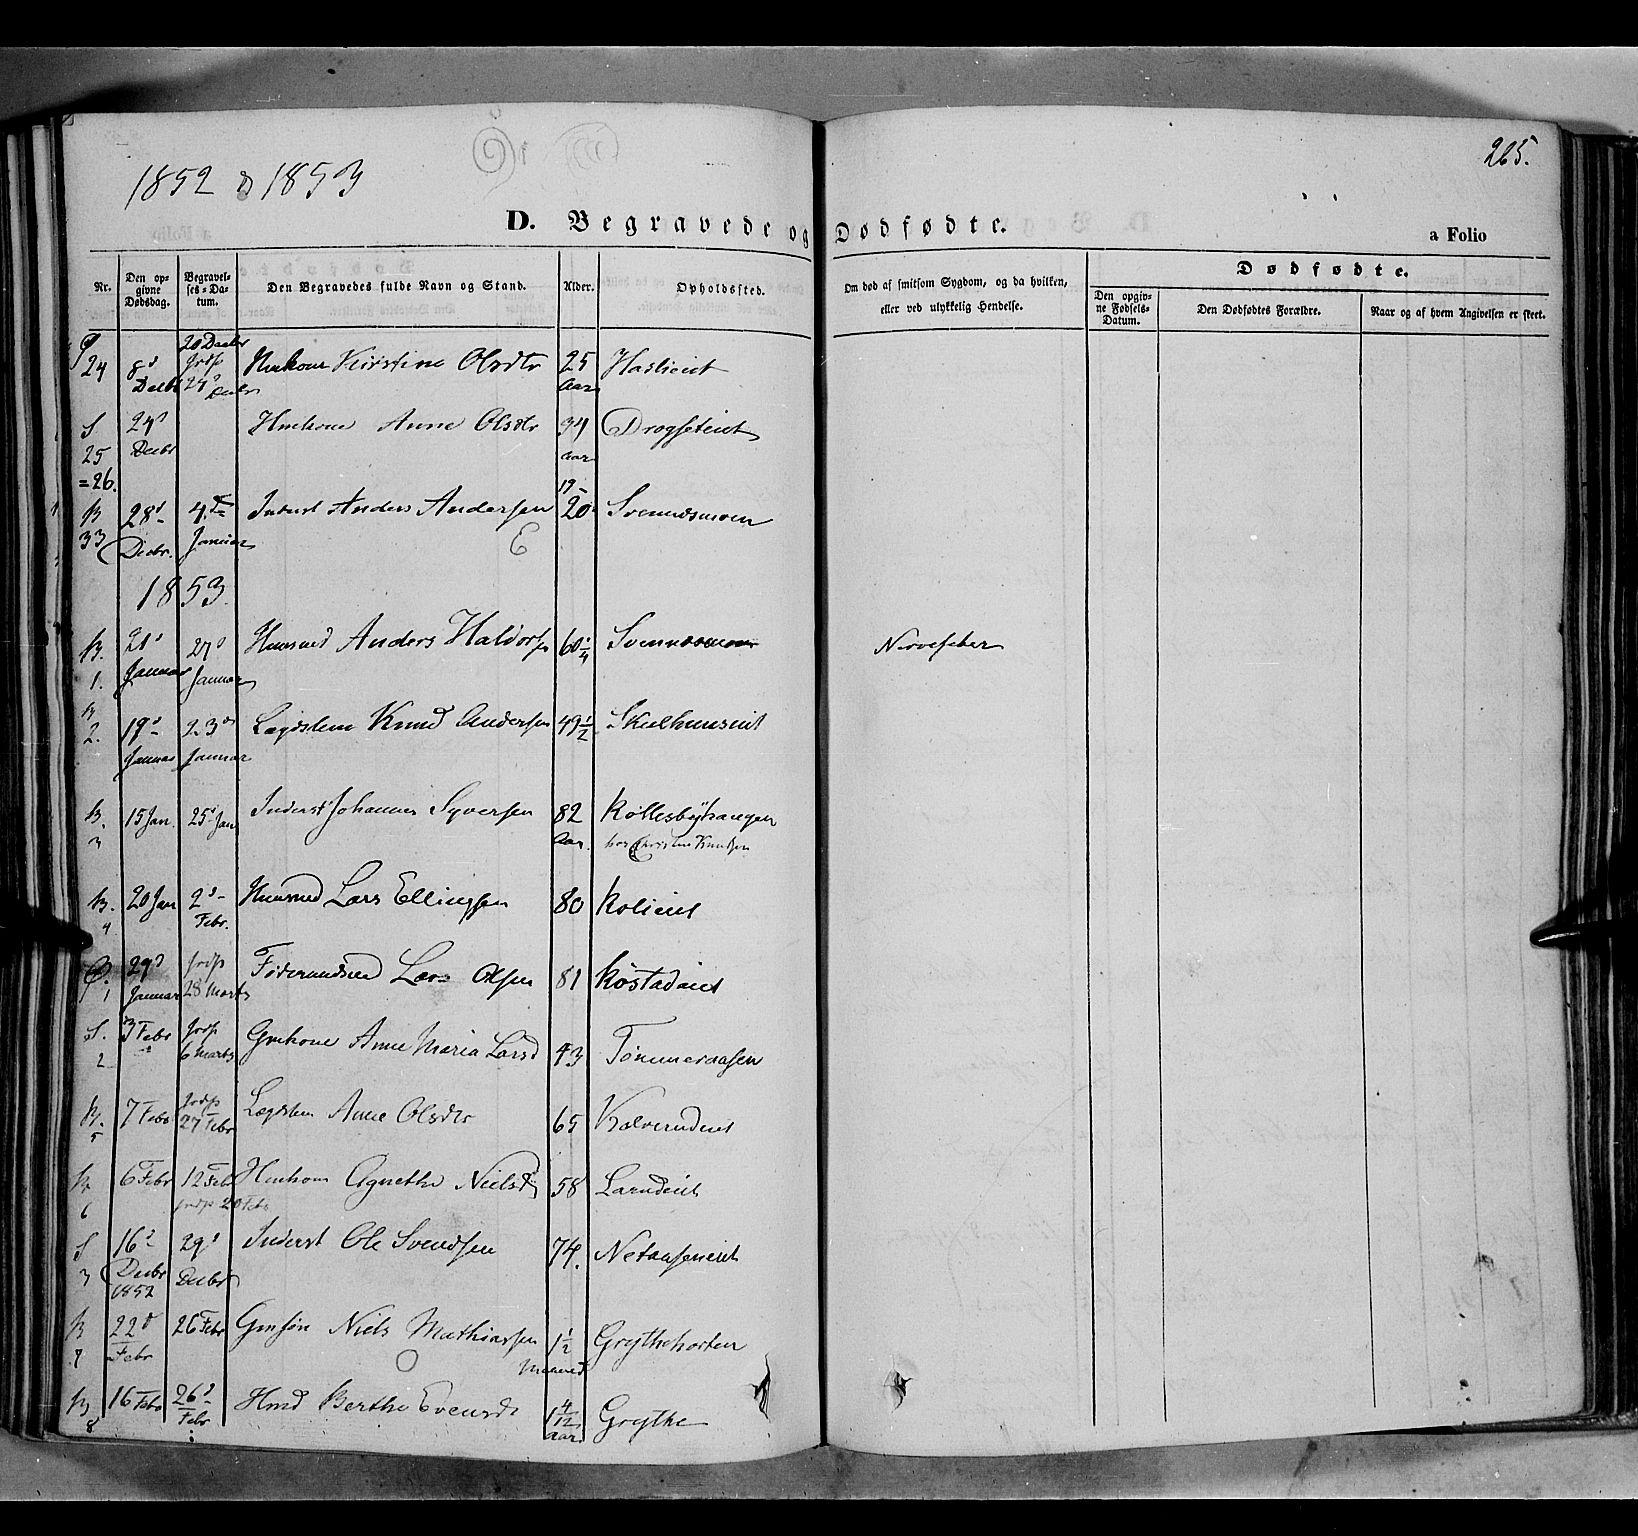 SAH, Biri prestekontor, Ministerialbok nr. 5, 1843-1854, s. 265